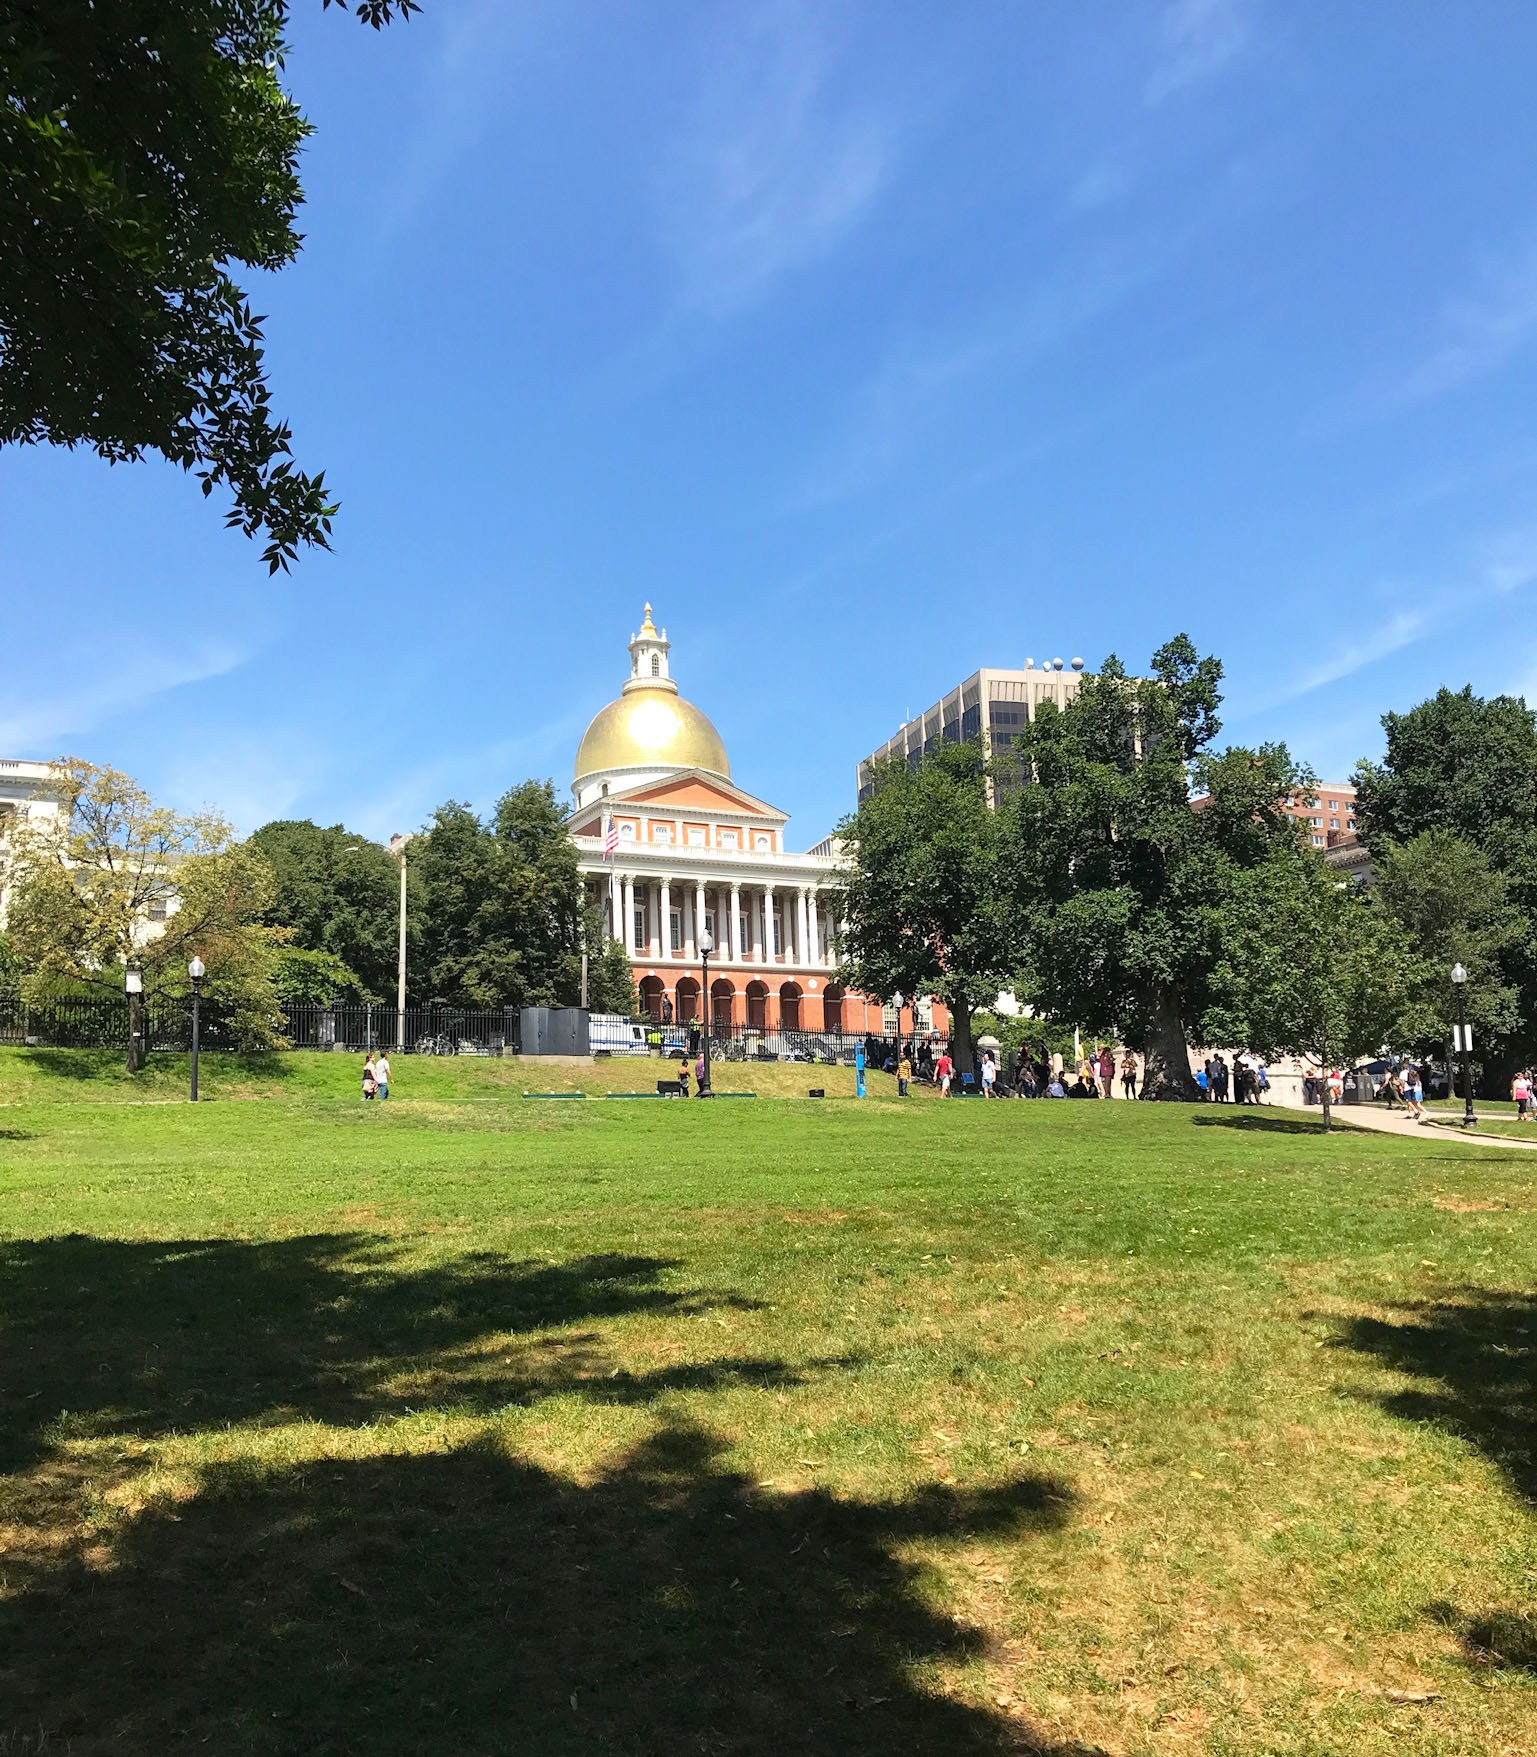 bostoncommon1 (1).jpg